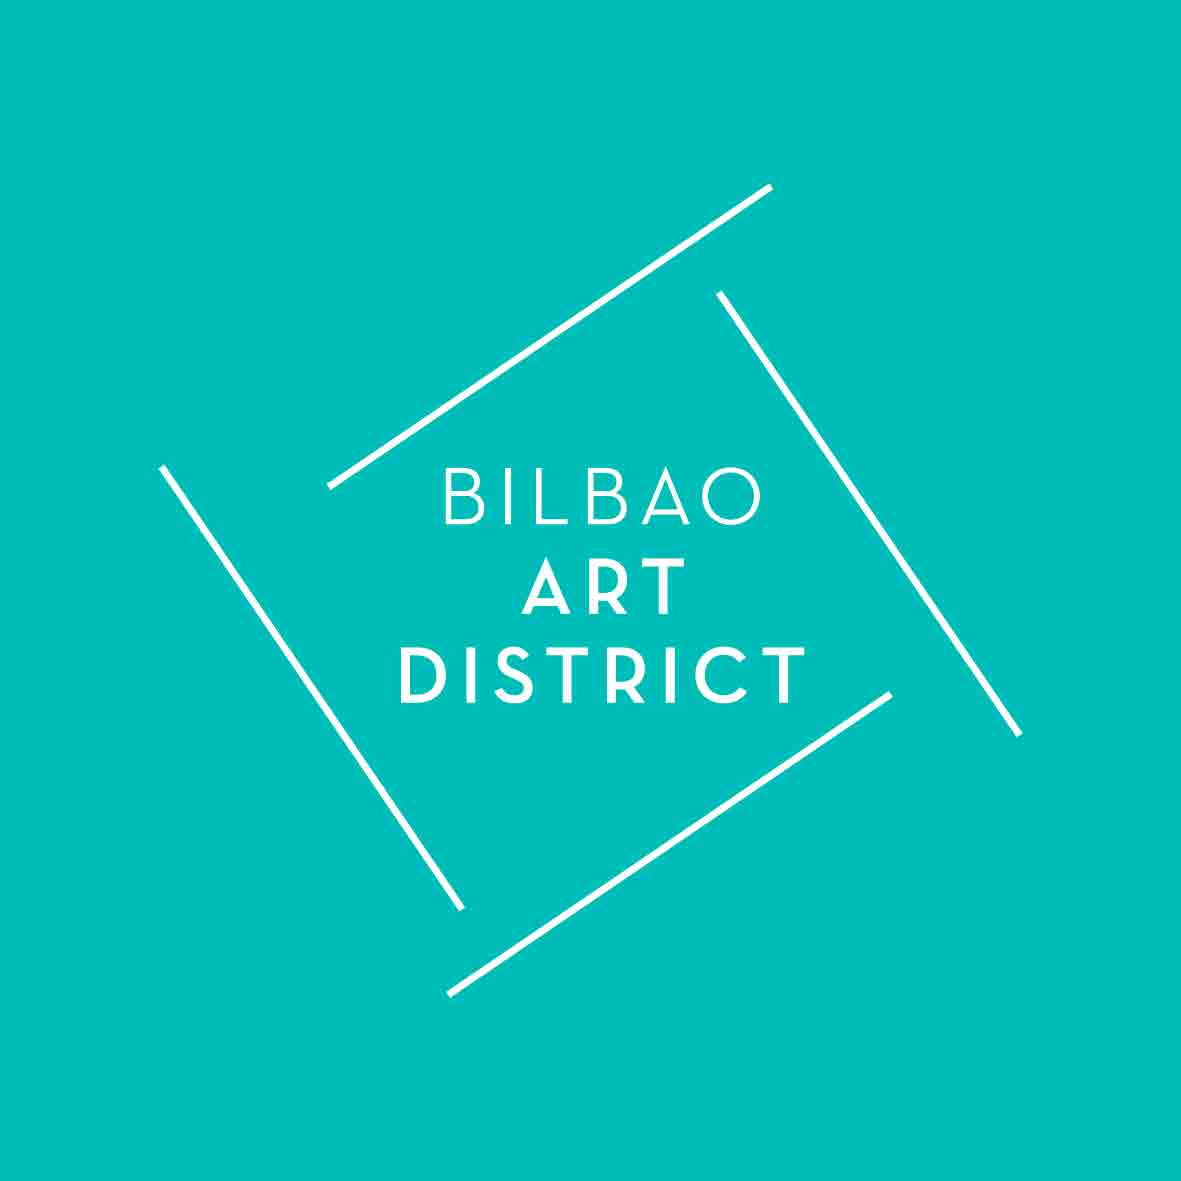 bilbao-art-district-2016